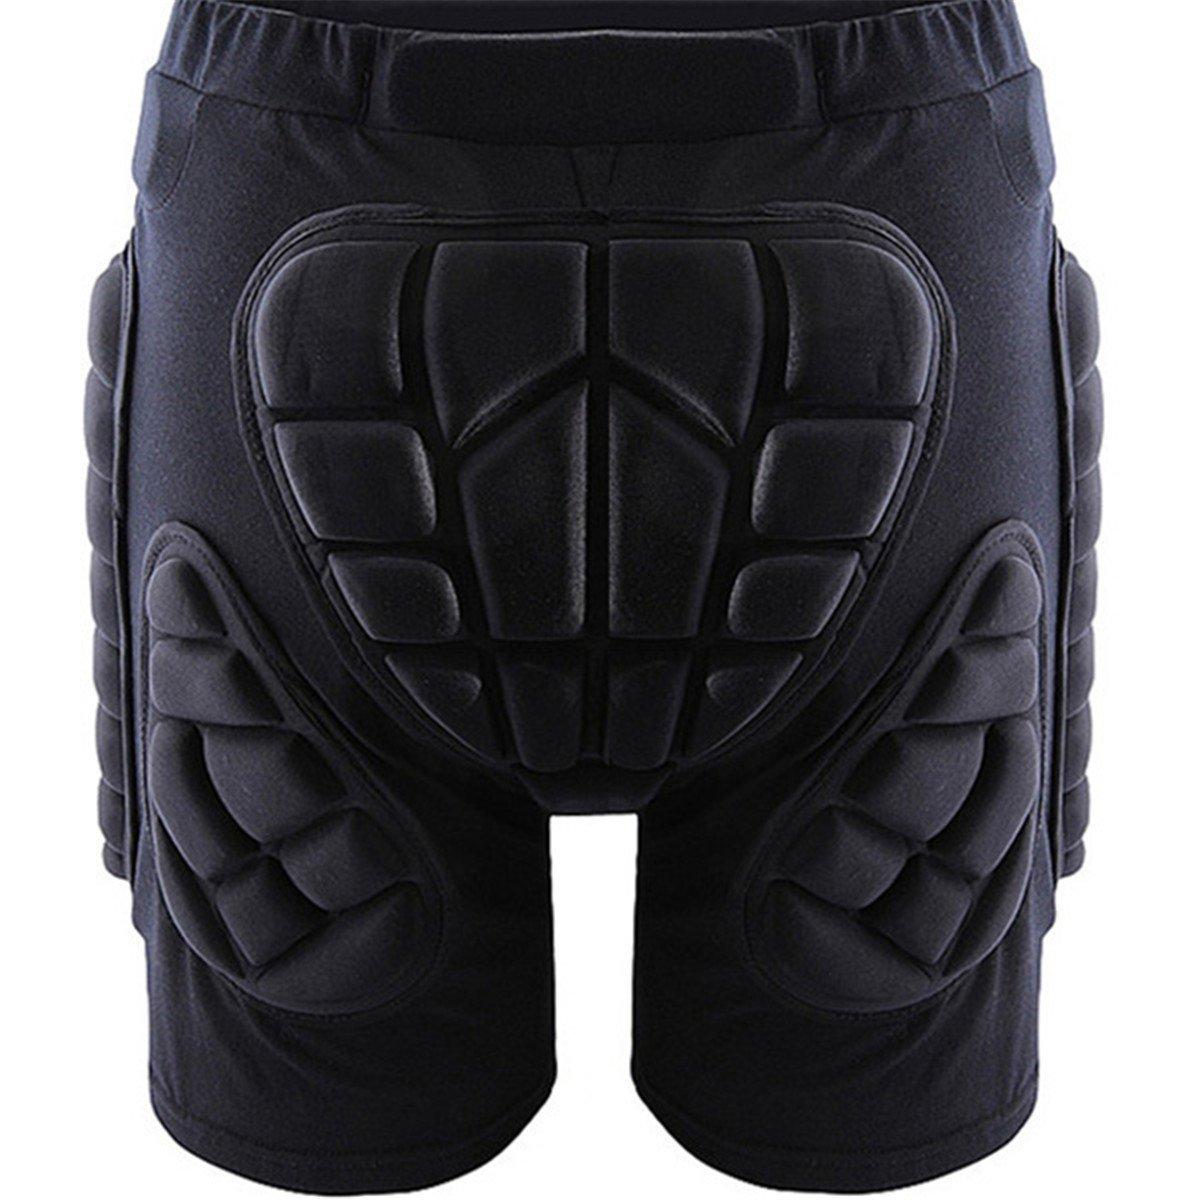 Protective Shorts,LOPEZ New Padded Shorts Protective Skiing Gear Hip Anti-drop Protection Sports Pants for Adults Children Ski Skate Snowboard Skating Skiing